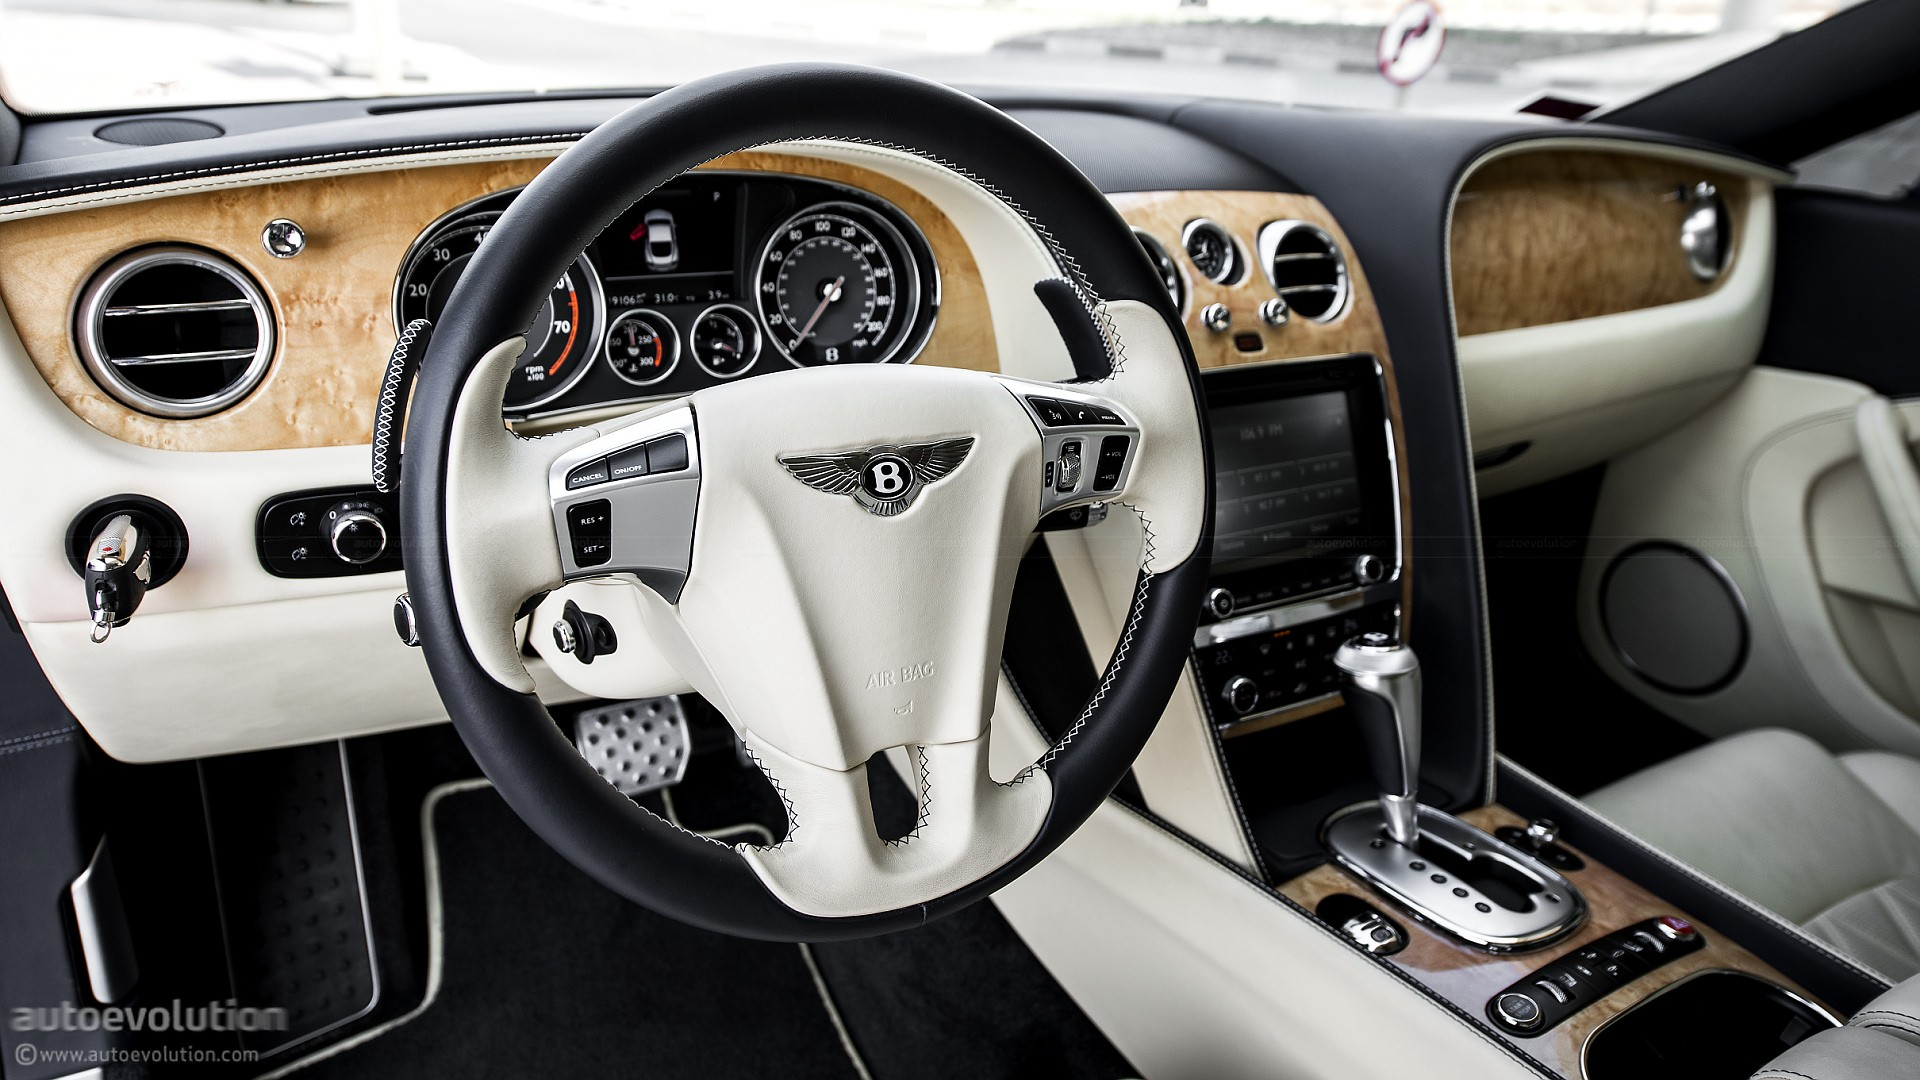 2018 bentley gt interior. wonderful interior 2014 bentley continental gt dashboard to 2018 bentley gt interior c